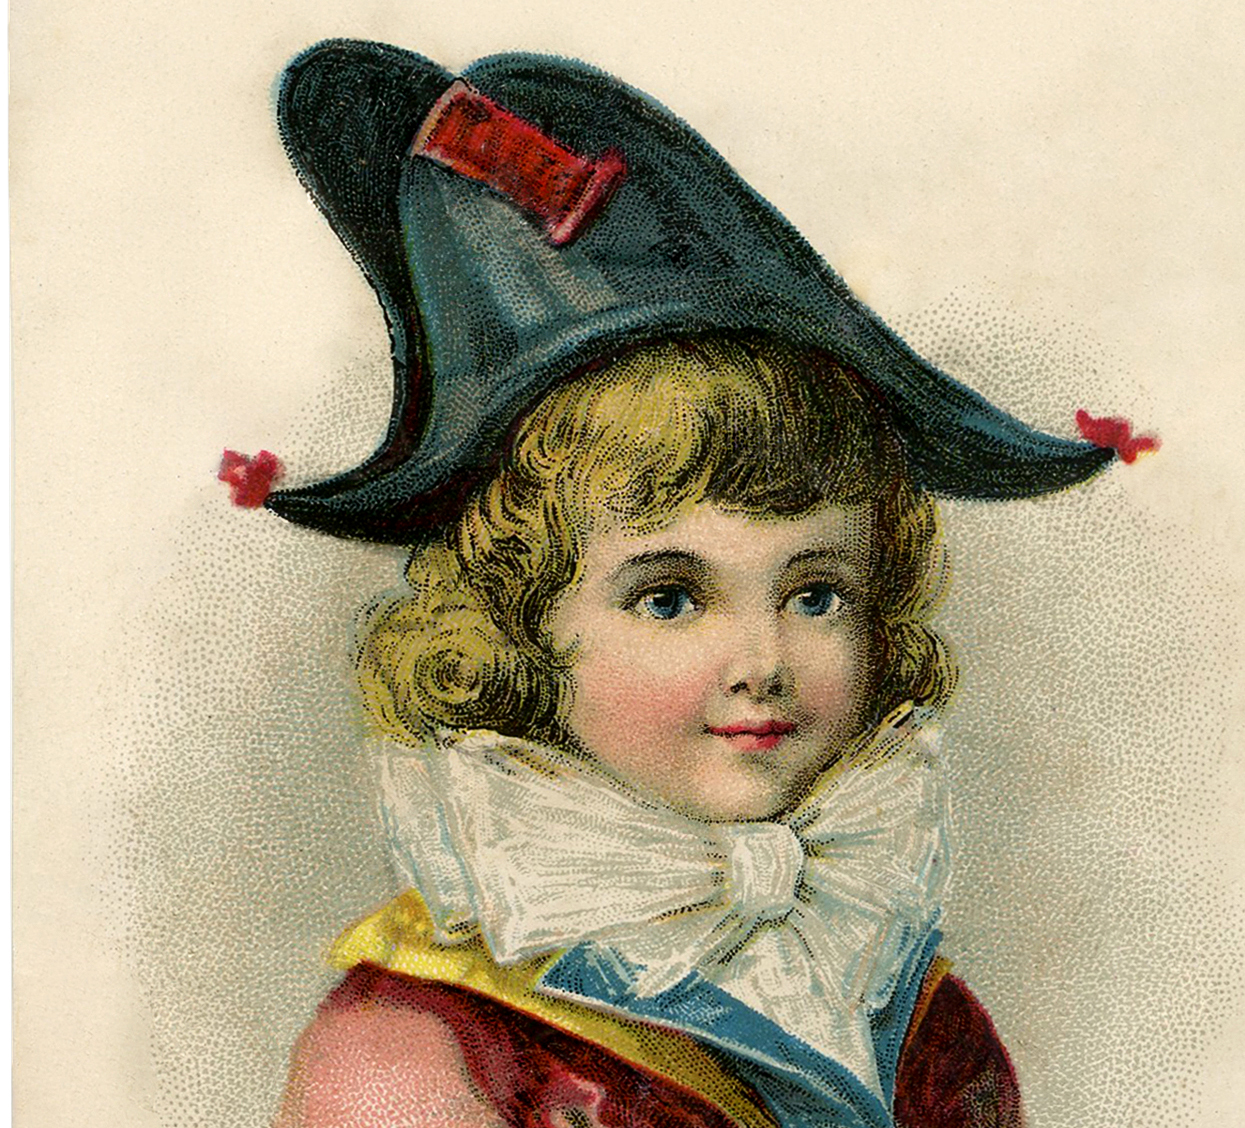 Bicorn Hat: Darling Bicorne Hat Boy Image!